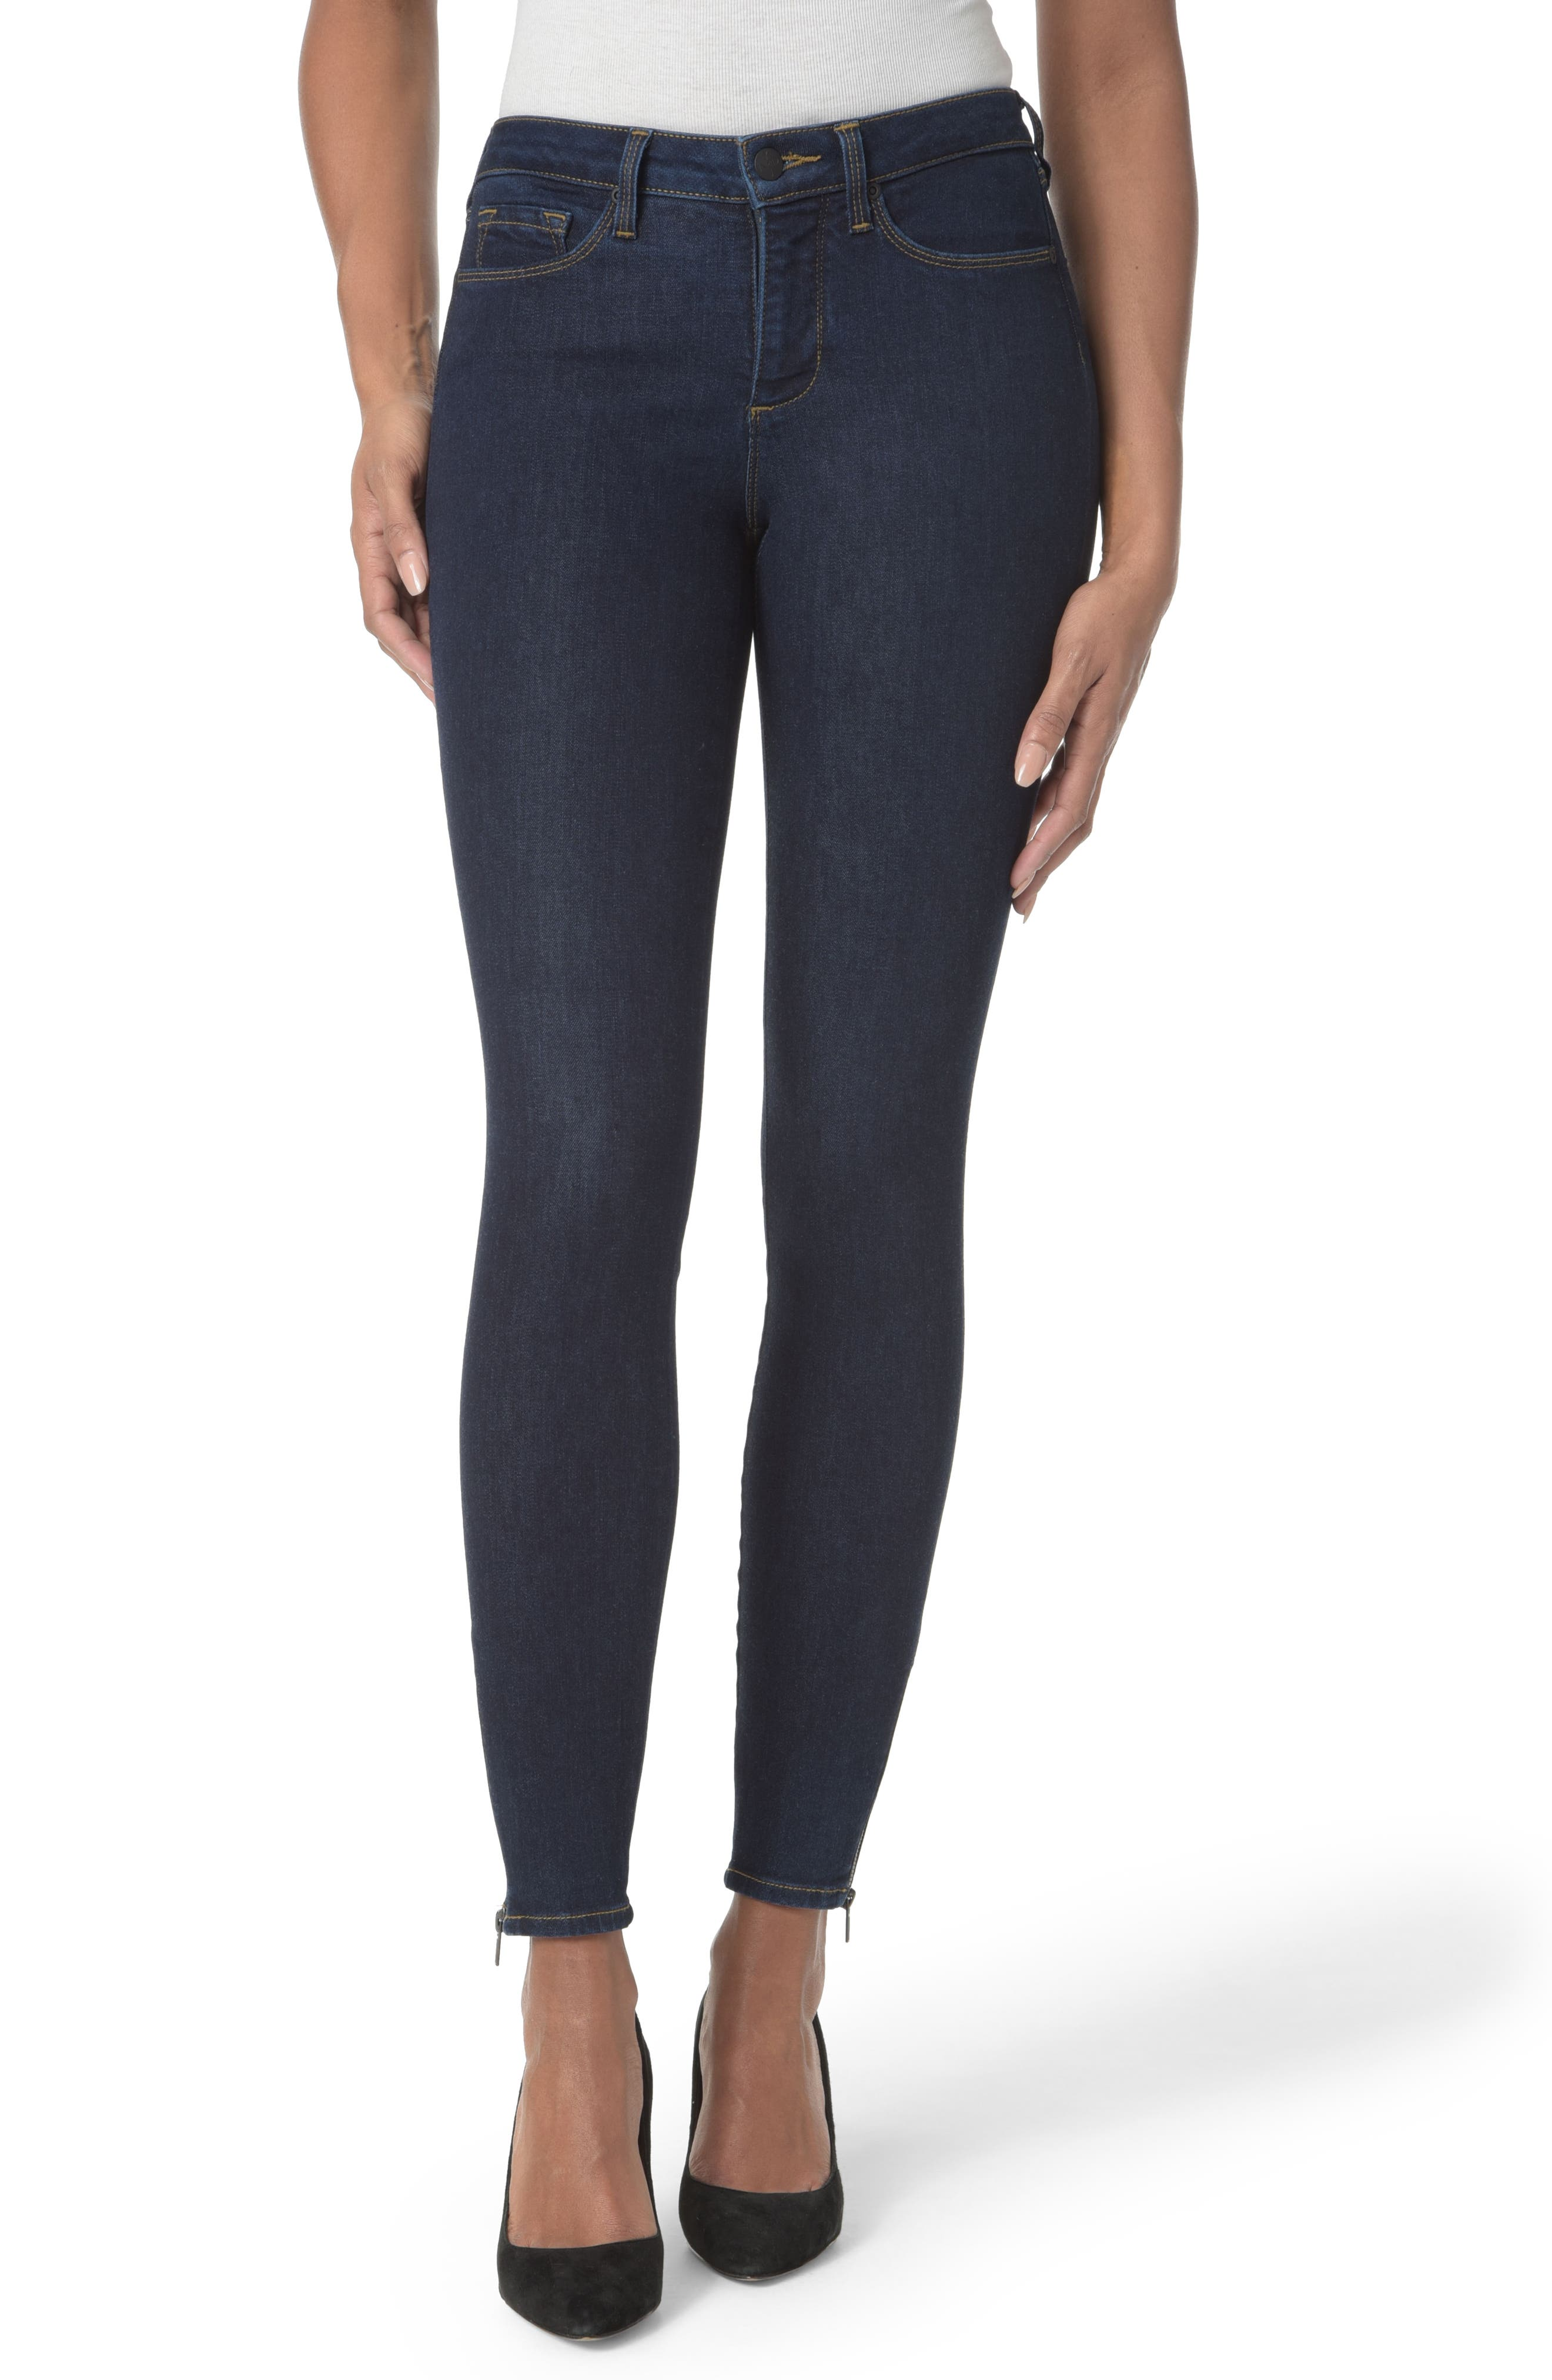 Main Image - NYDJ Dylan Ankle Zipper Hem Skinny Jeans (Rinse)